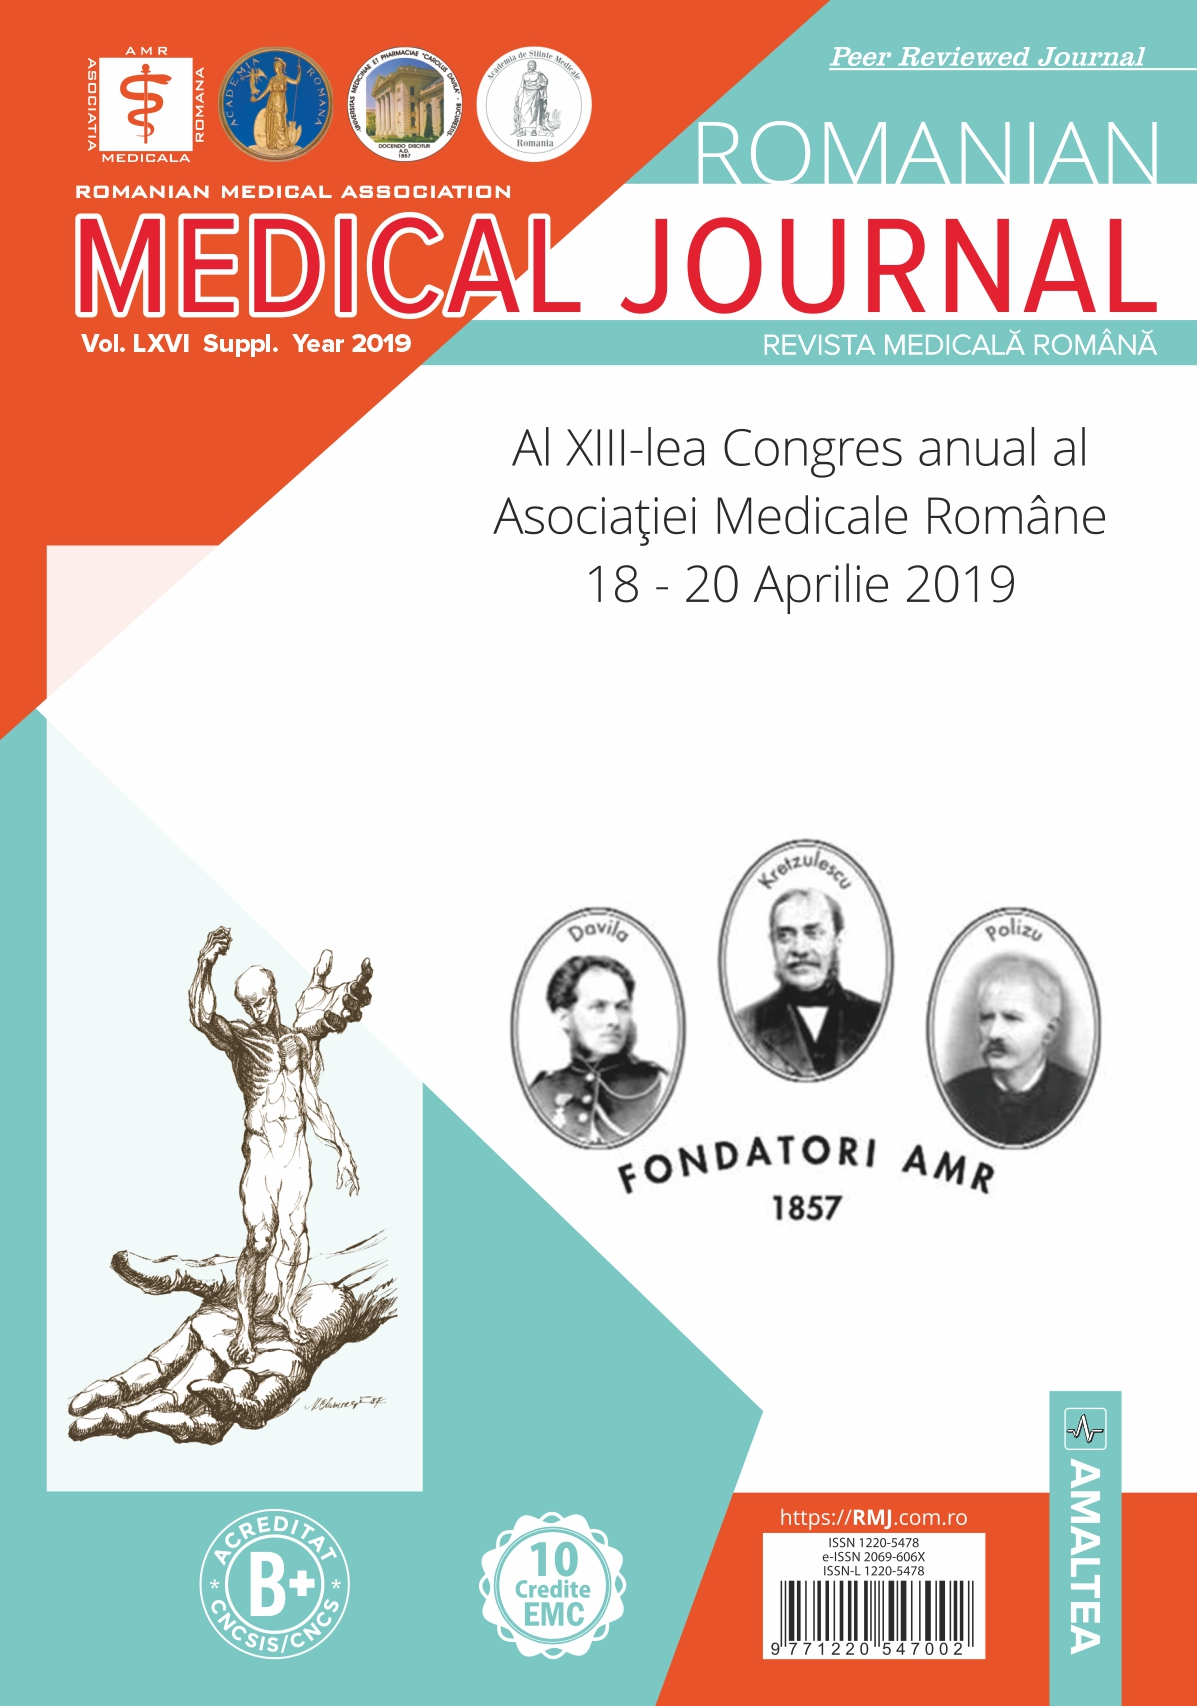 Romanian Medical Journal - REVISTA MEDICALA ROMANA, Vol. LXVI, Suppl., Year 2019